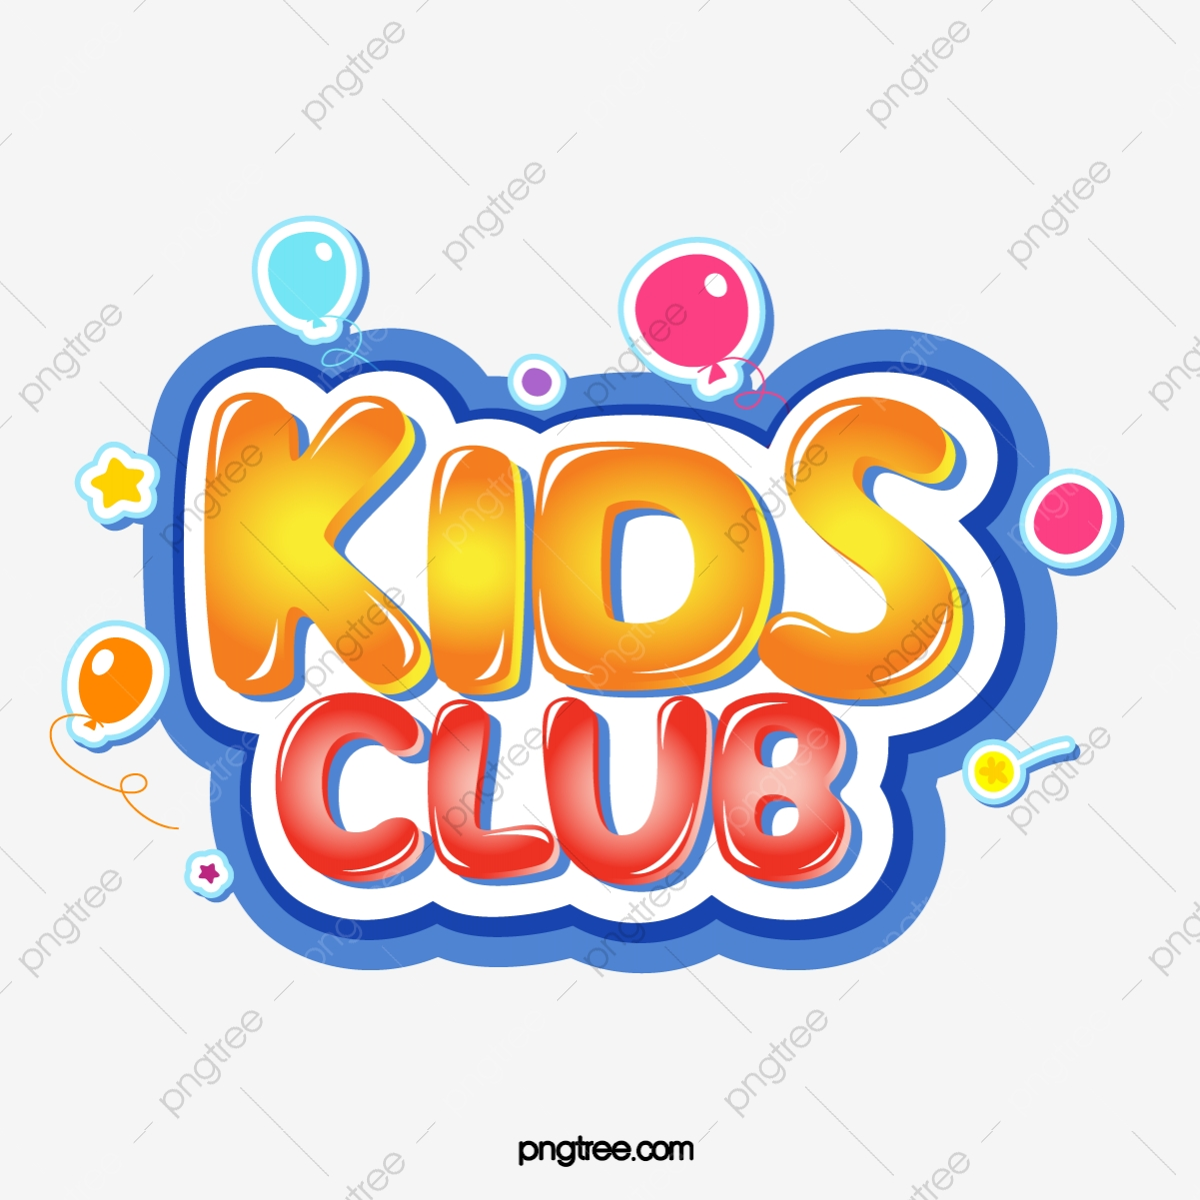 Kids Club Cute Jelly Bubbles Stereo Gradient Word Art Children S